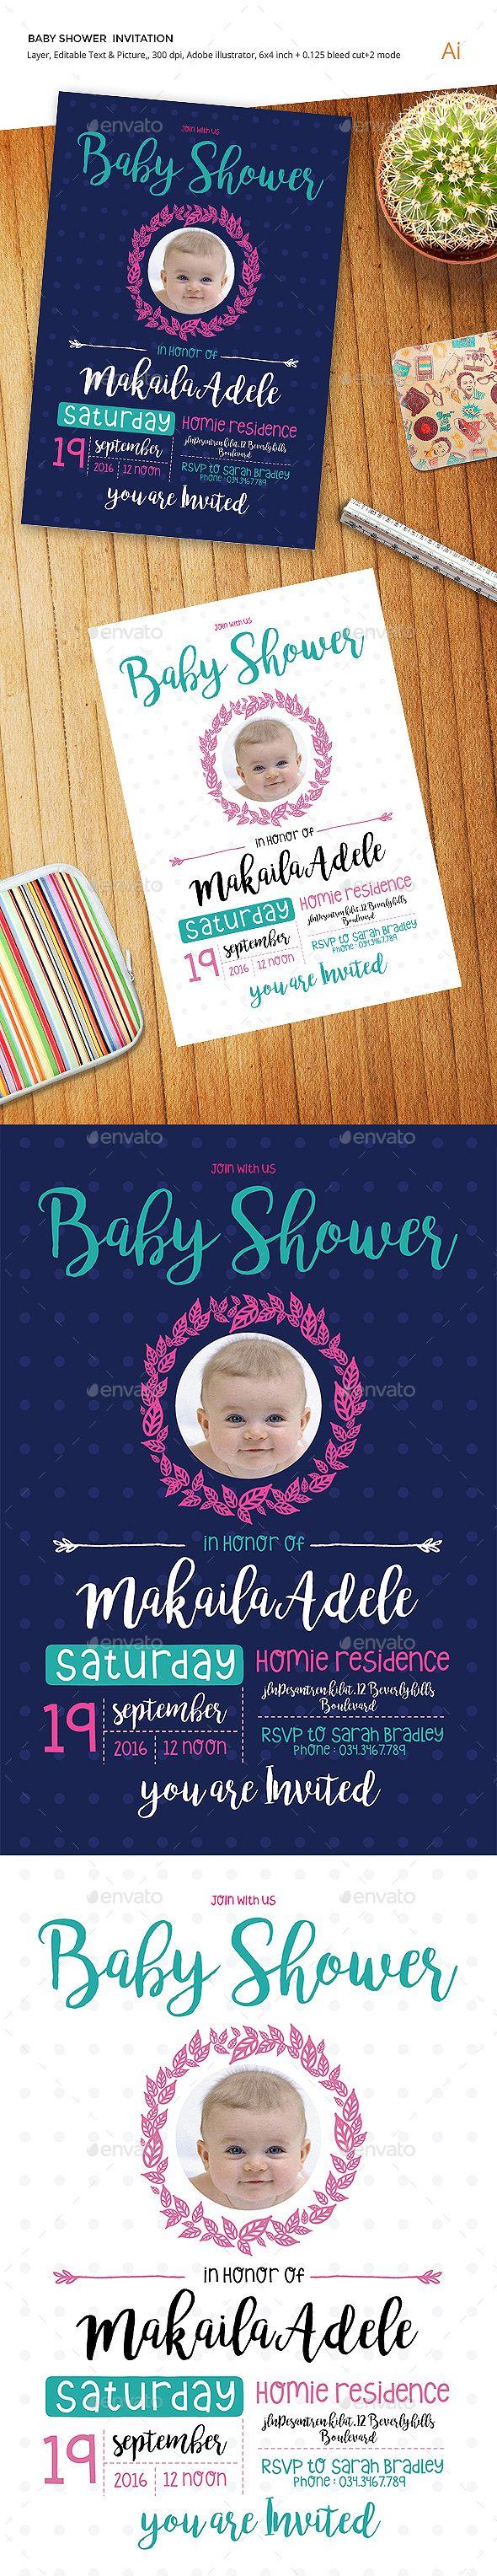 Baby Shower Invitation 672 best Invitation Template